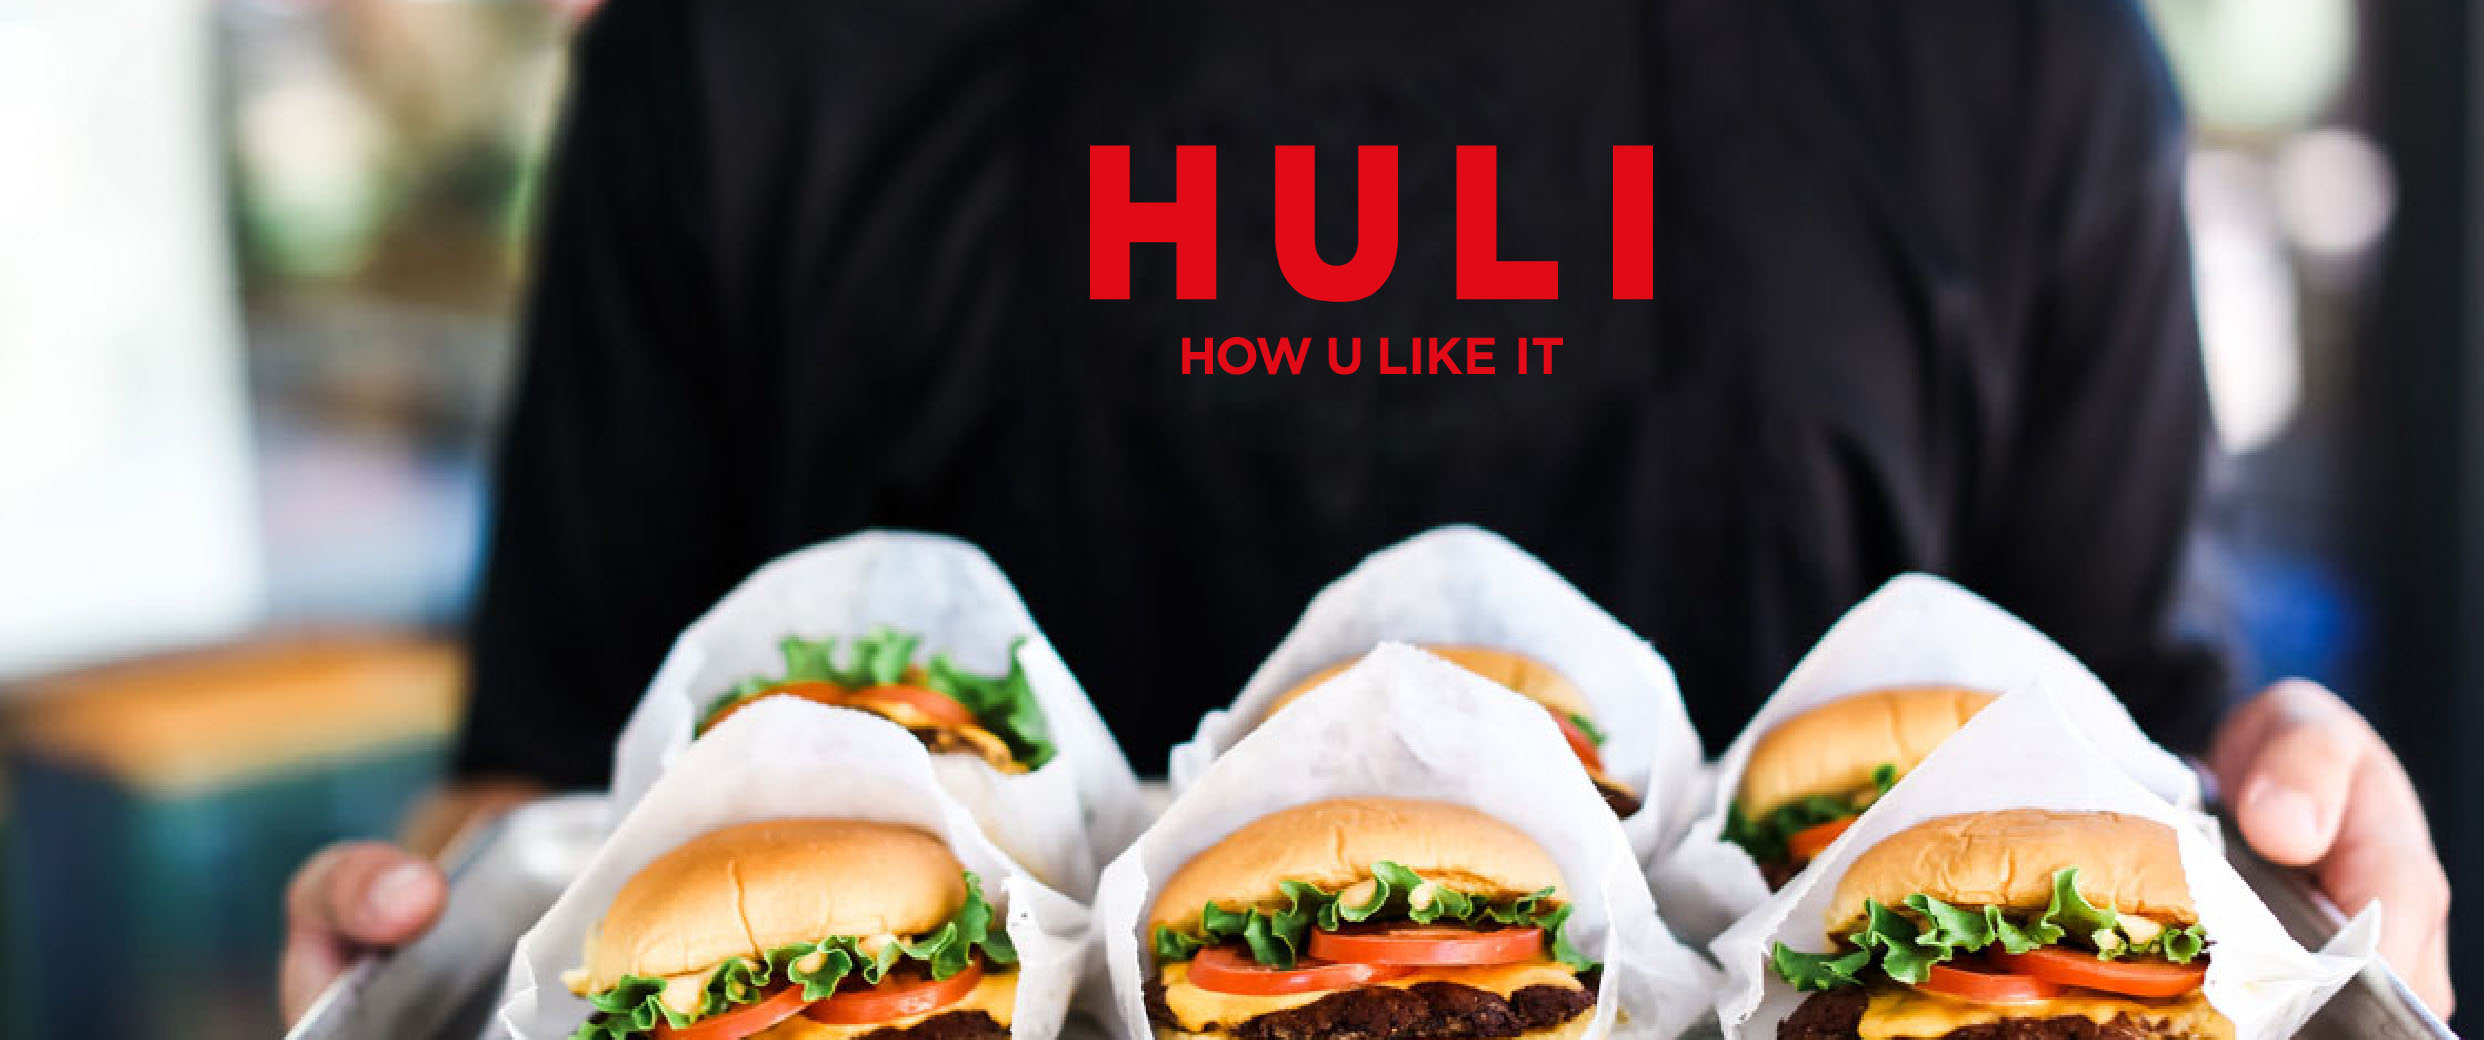 LMPP Huli Burger Uniform.jpg